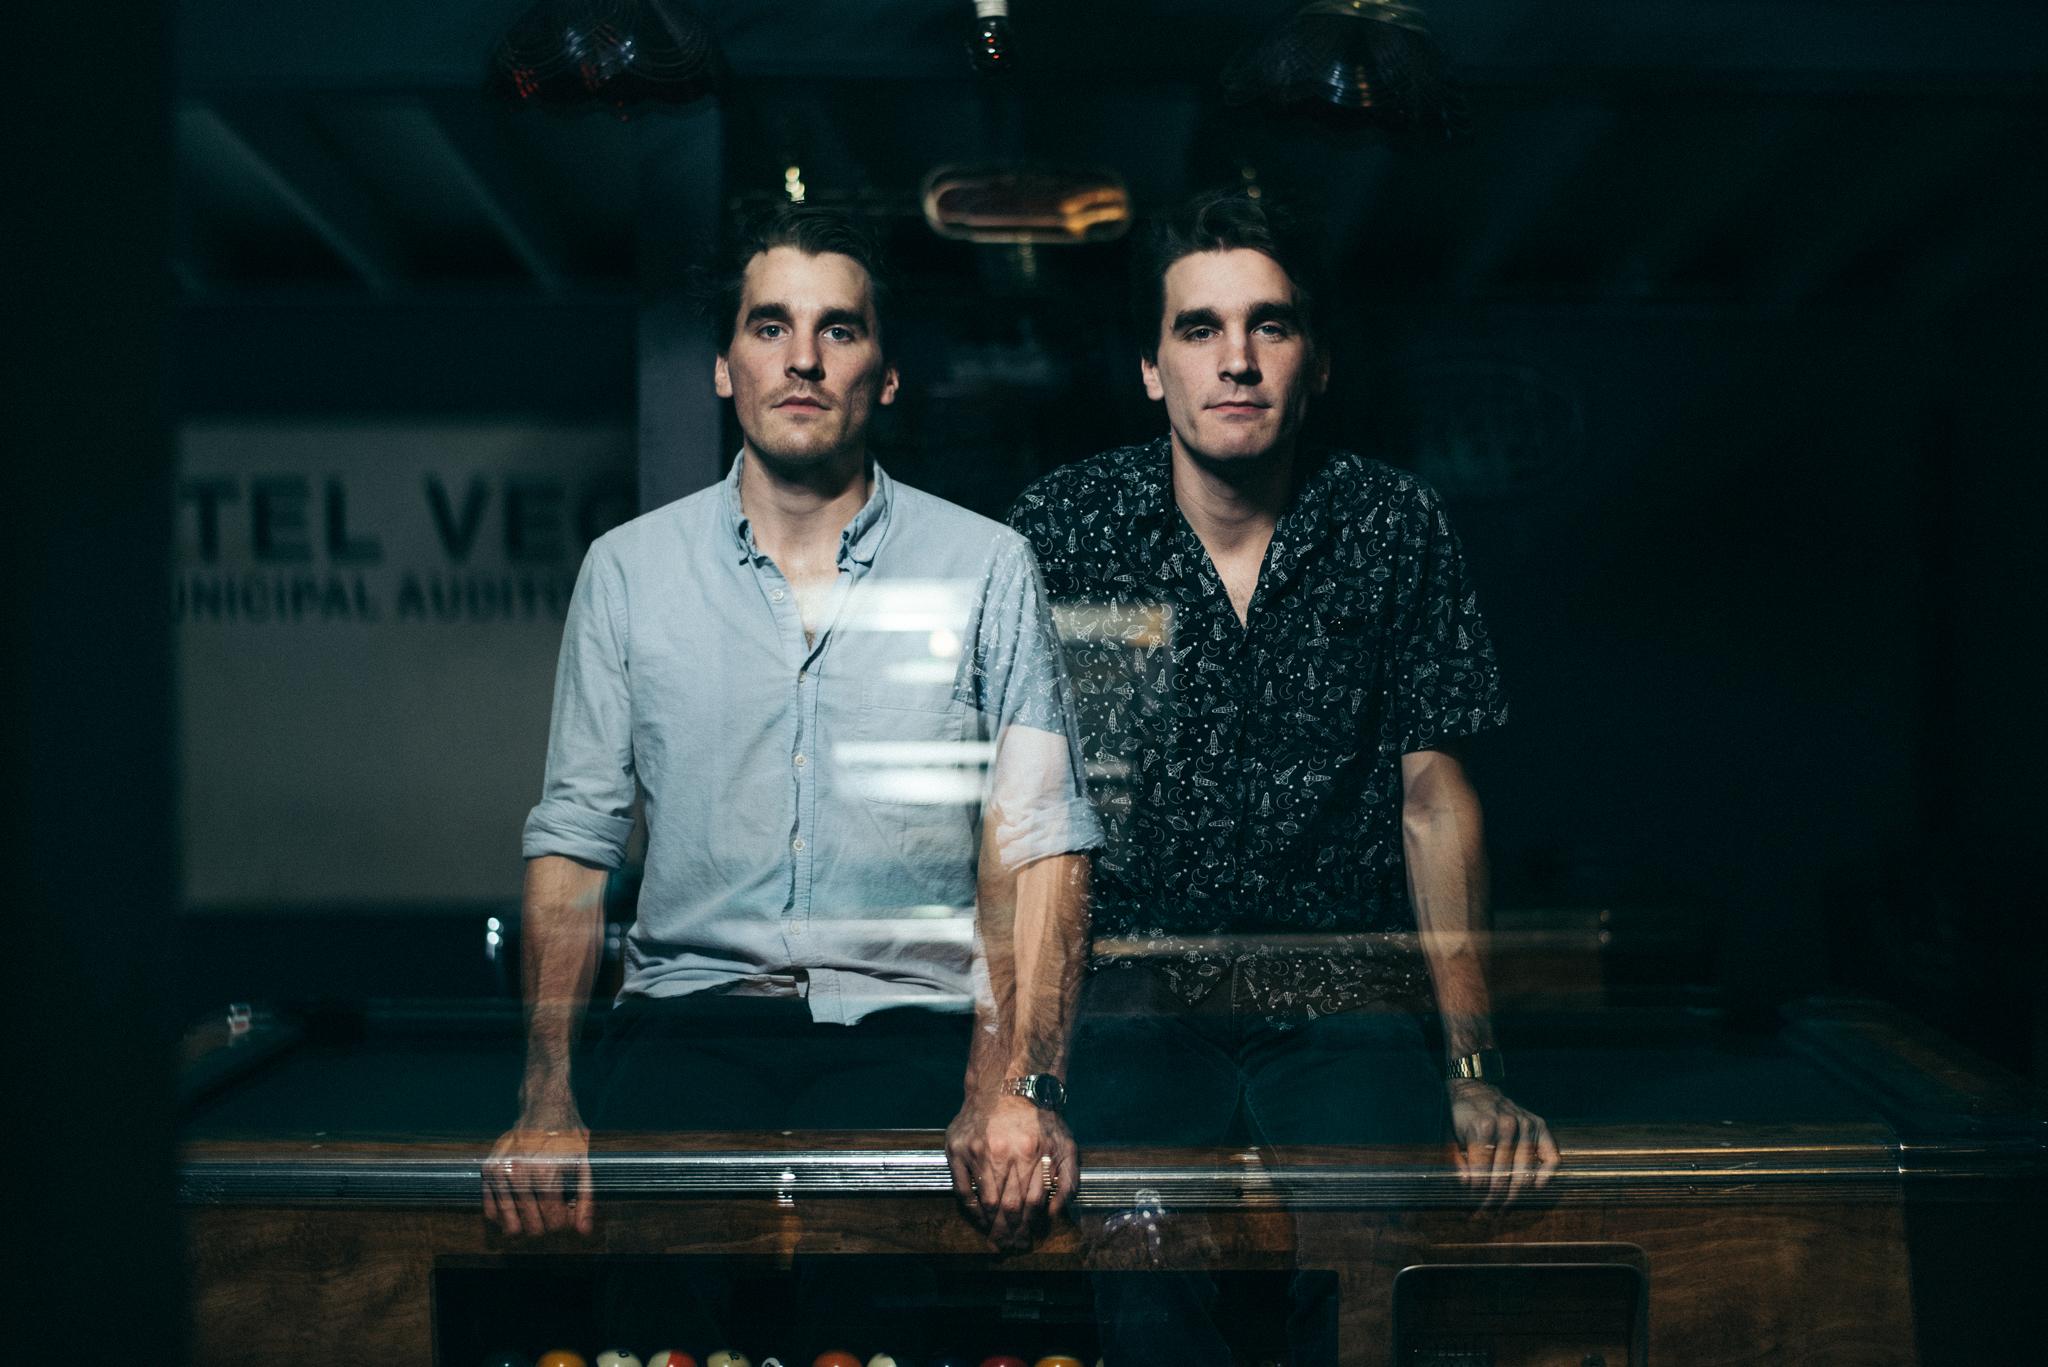 Bond-twins-austin-band-promo-4.jpg